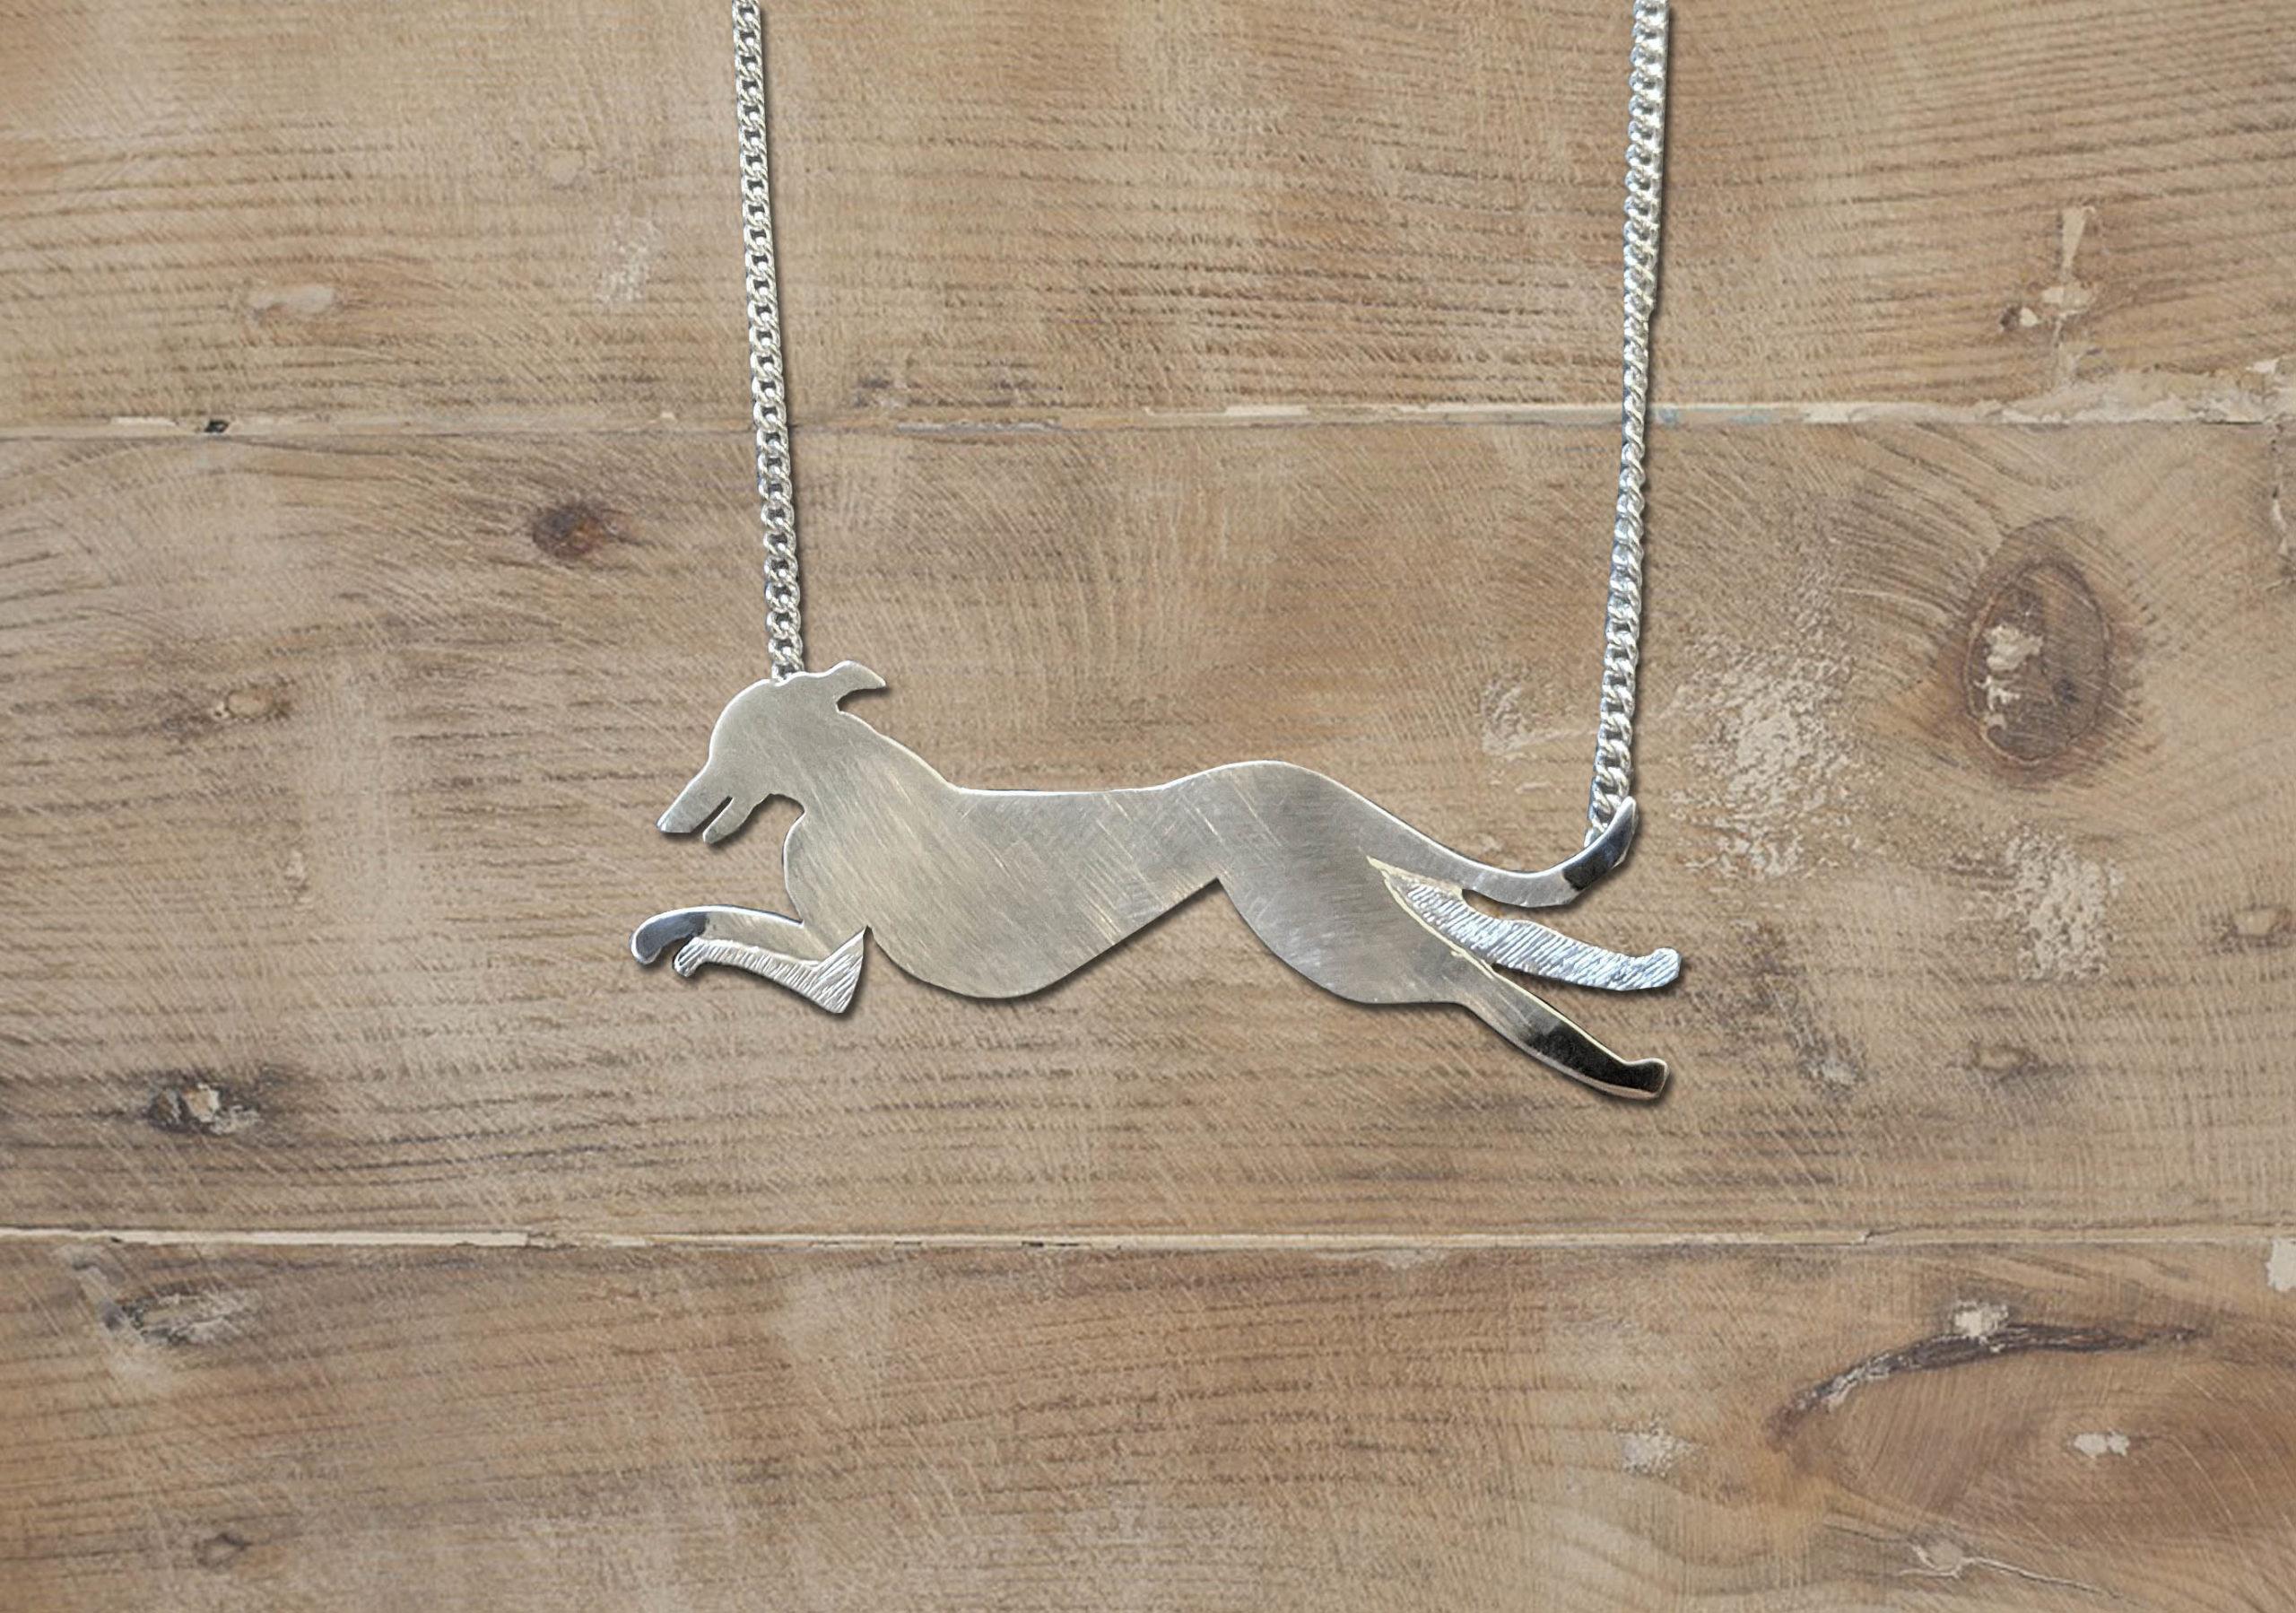 Park Road Jewellery, Bespoke Handmade Sterling Silver Dog Greyhound Pet Necklace Jewellery